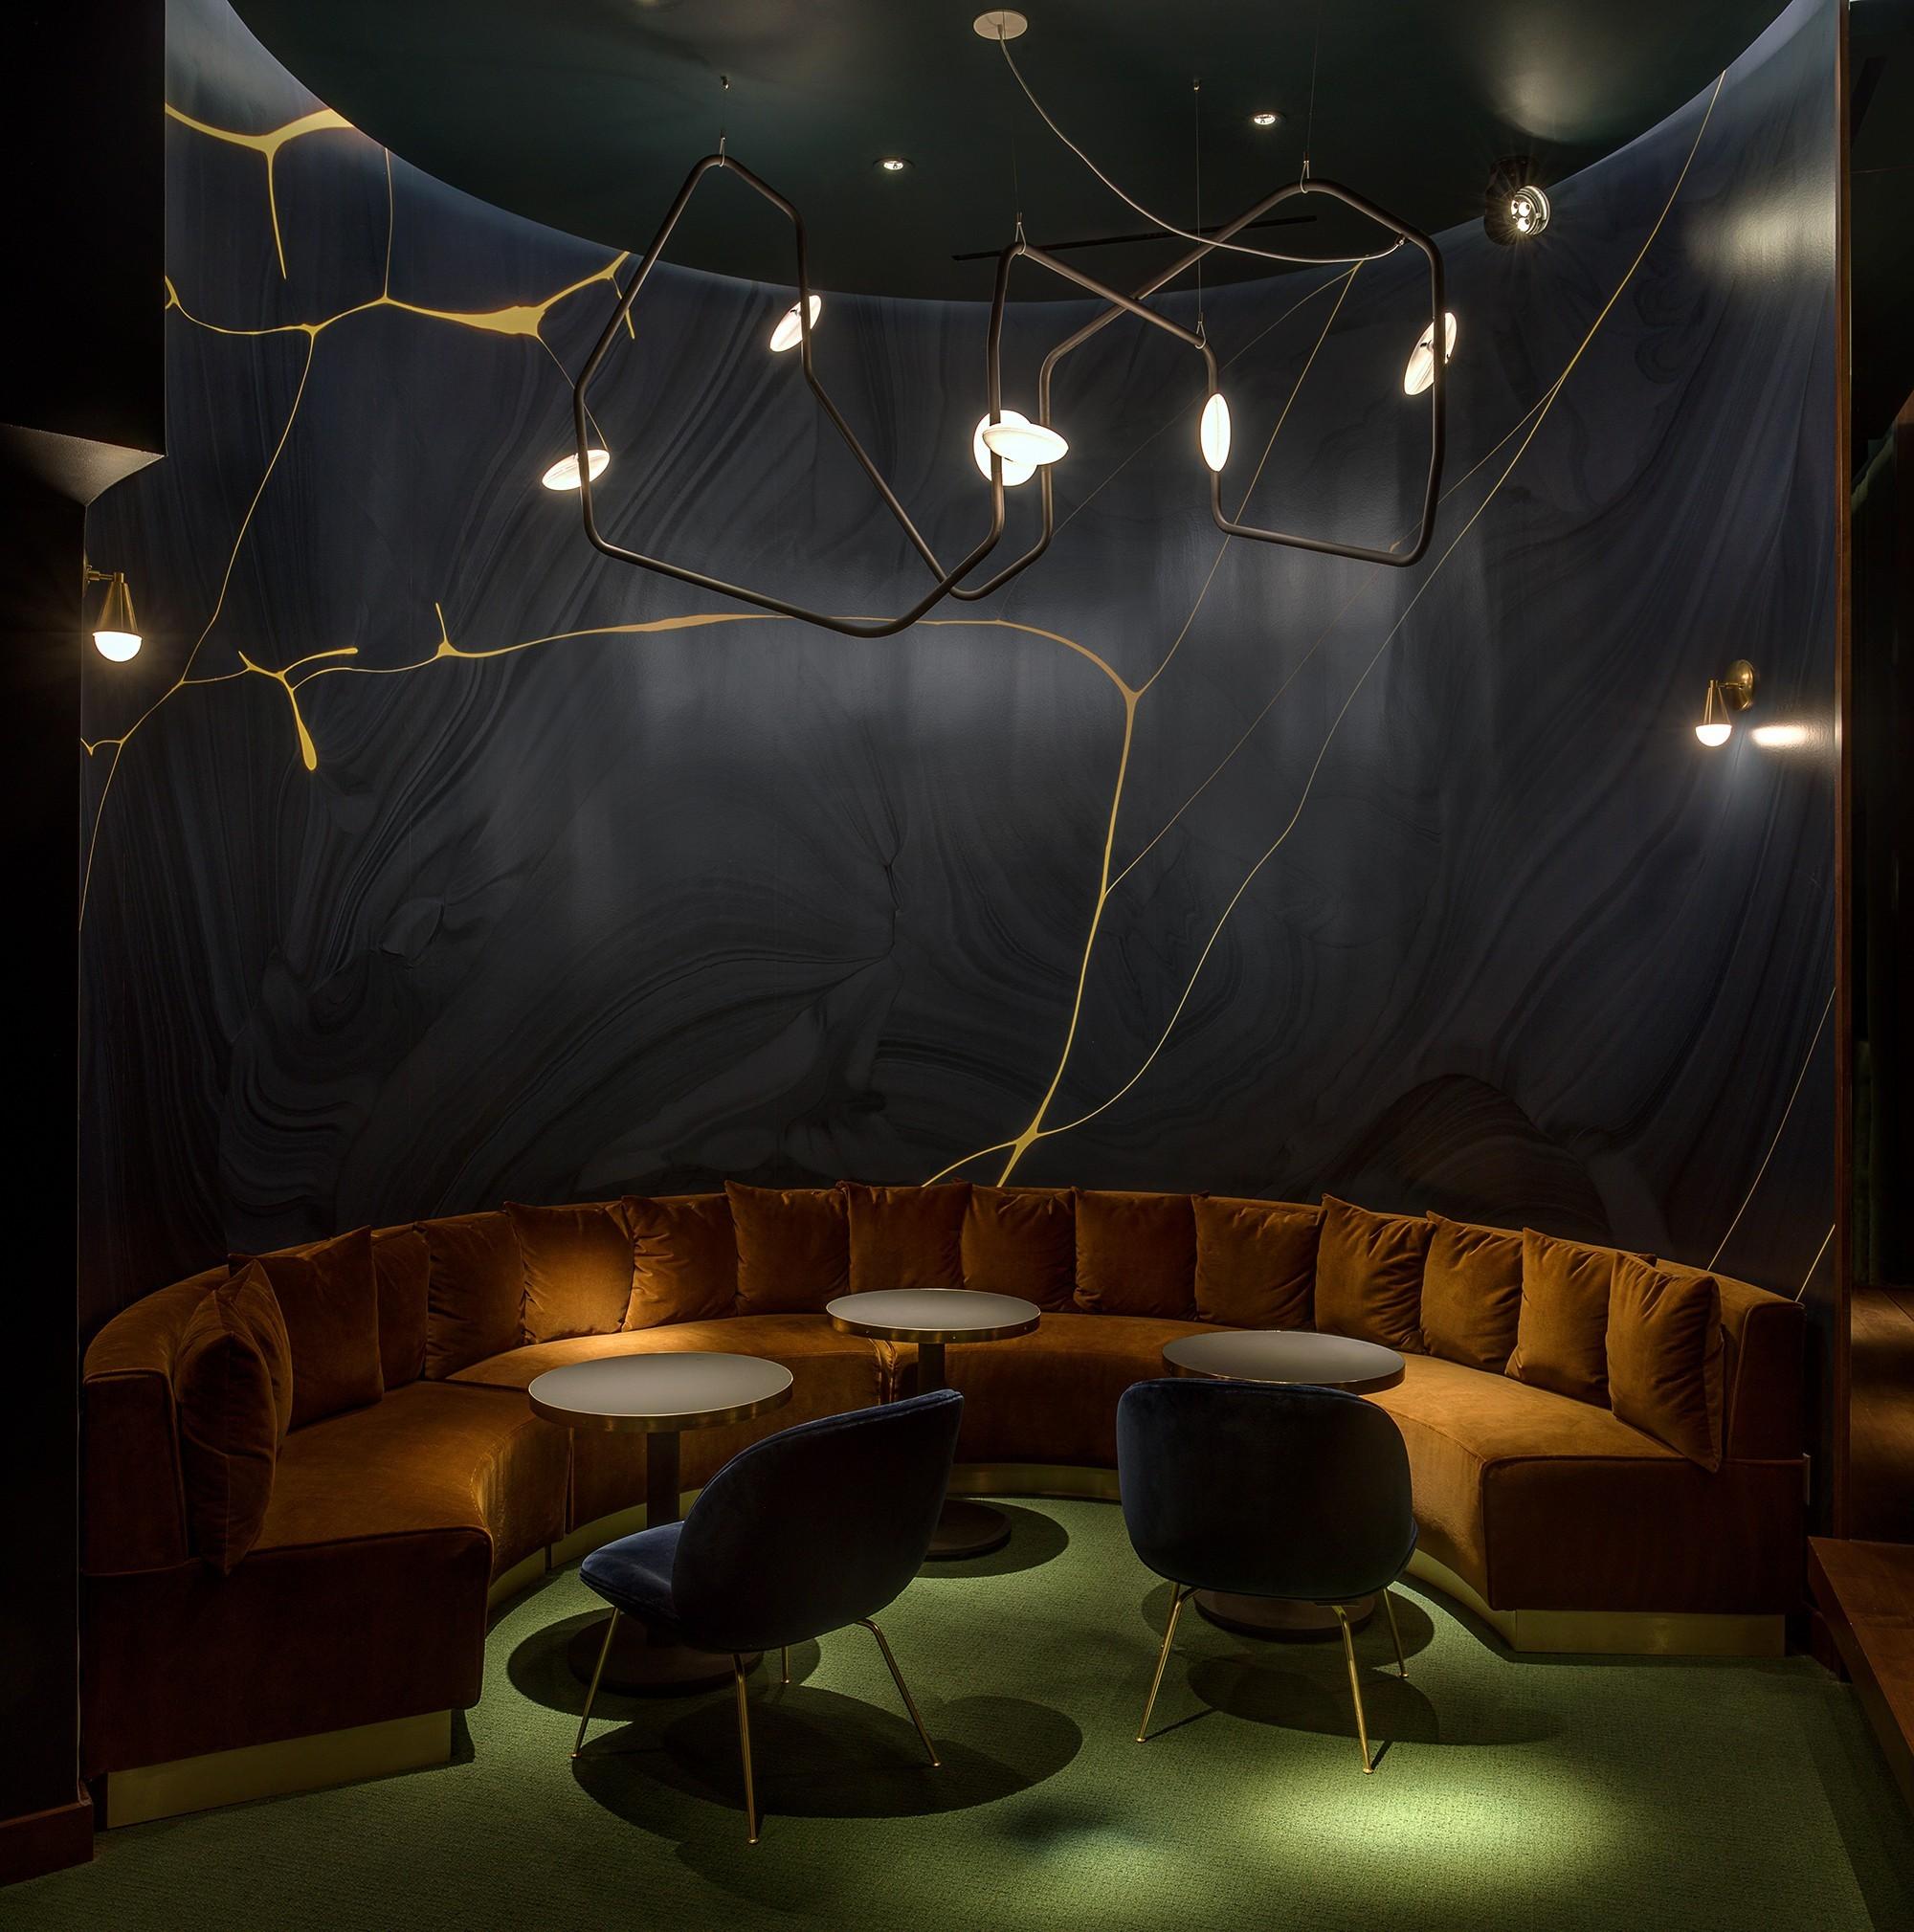 5. MDMF Karaoke Room